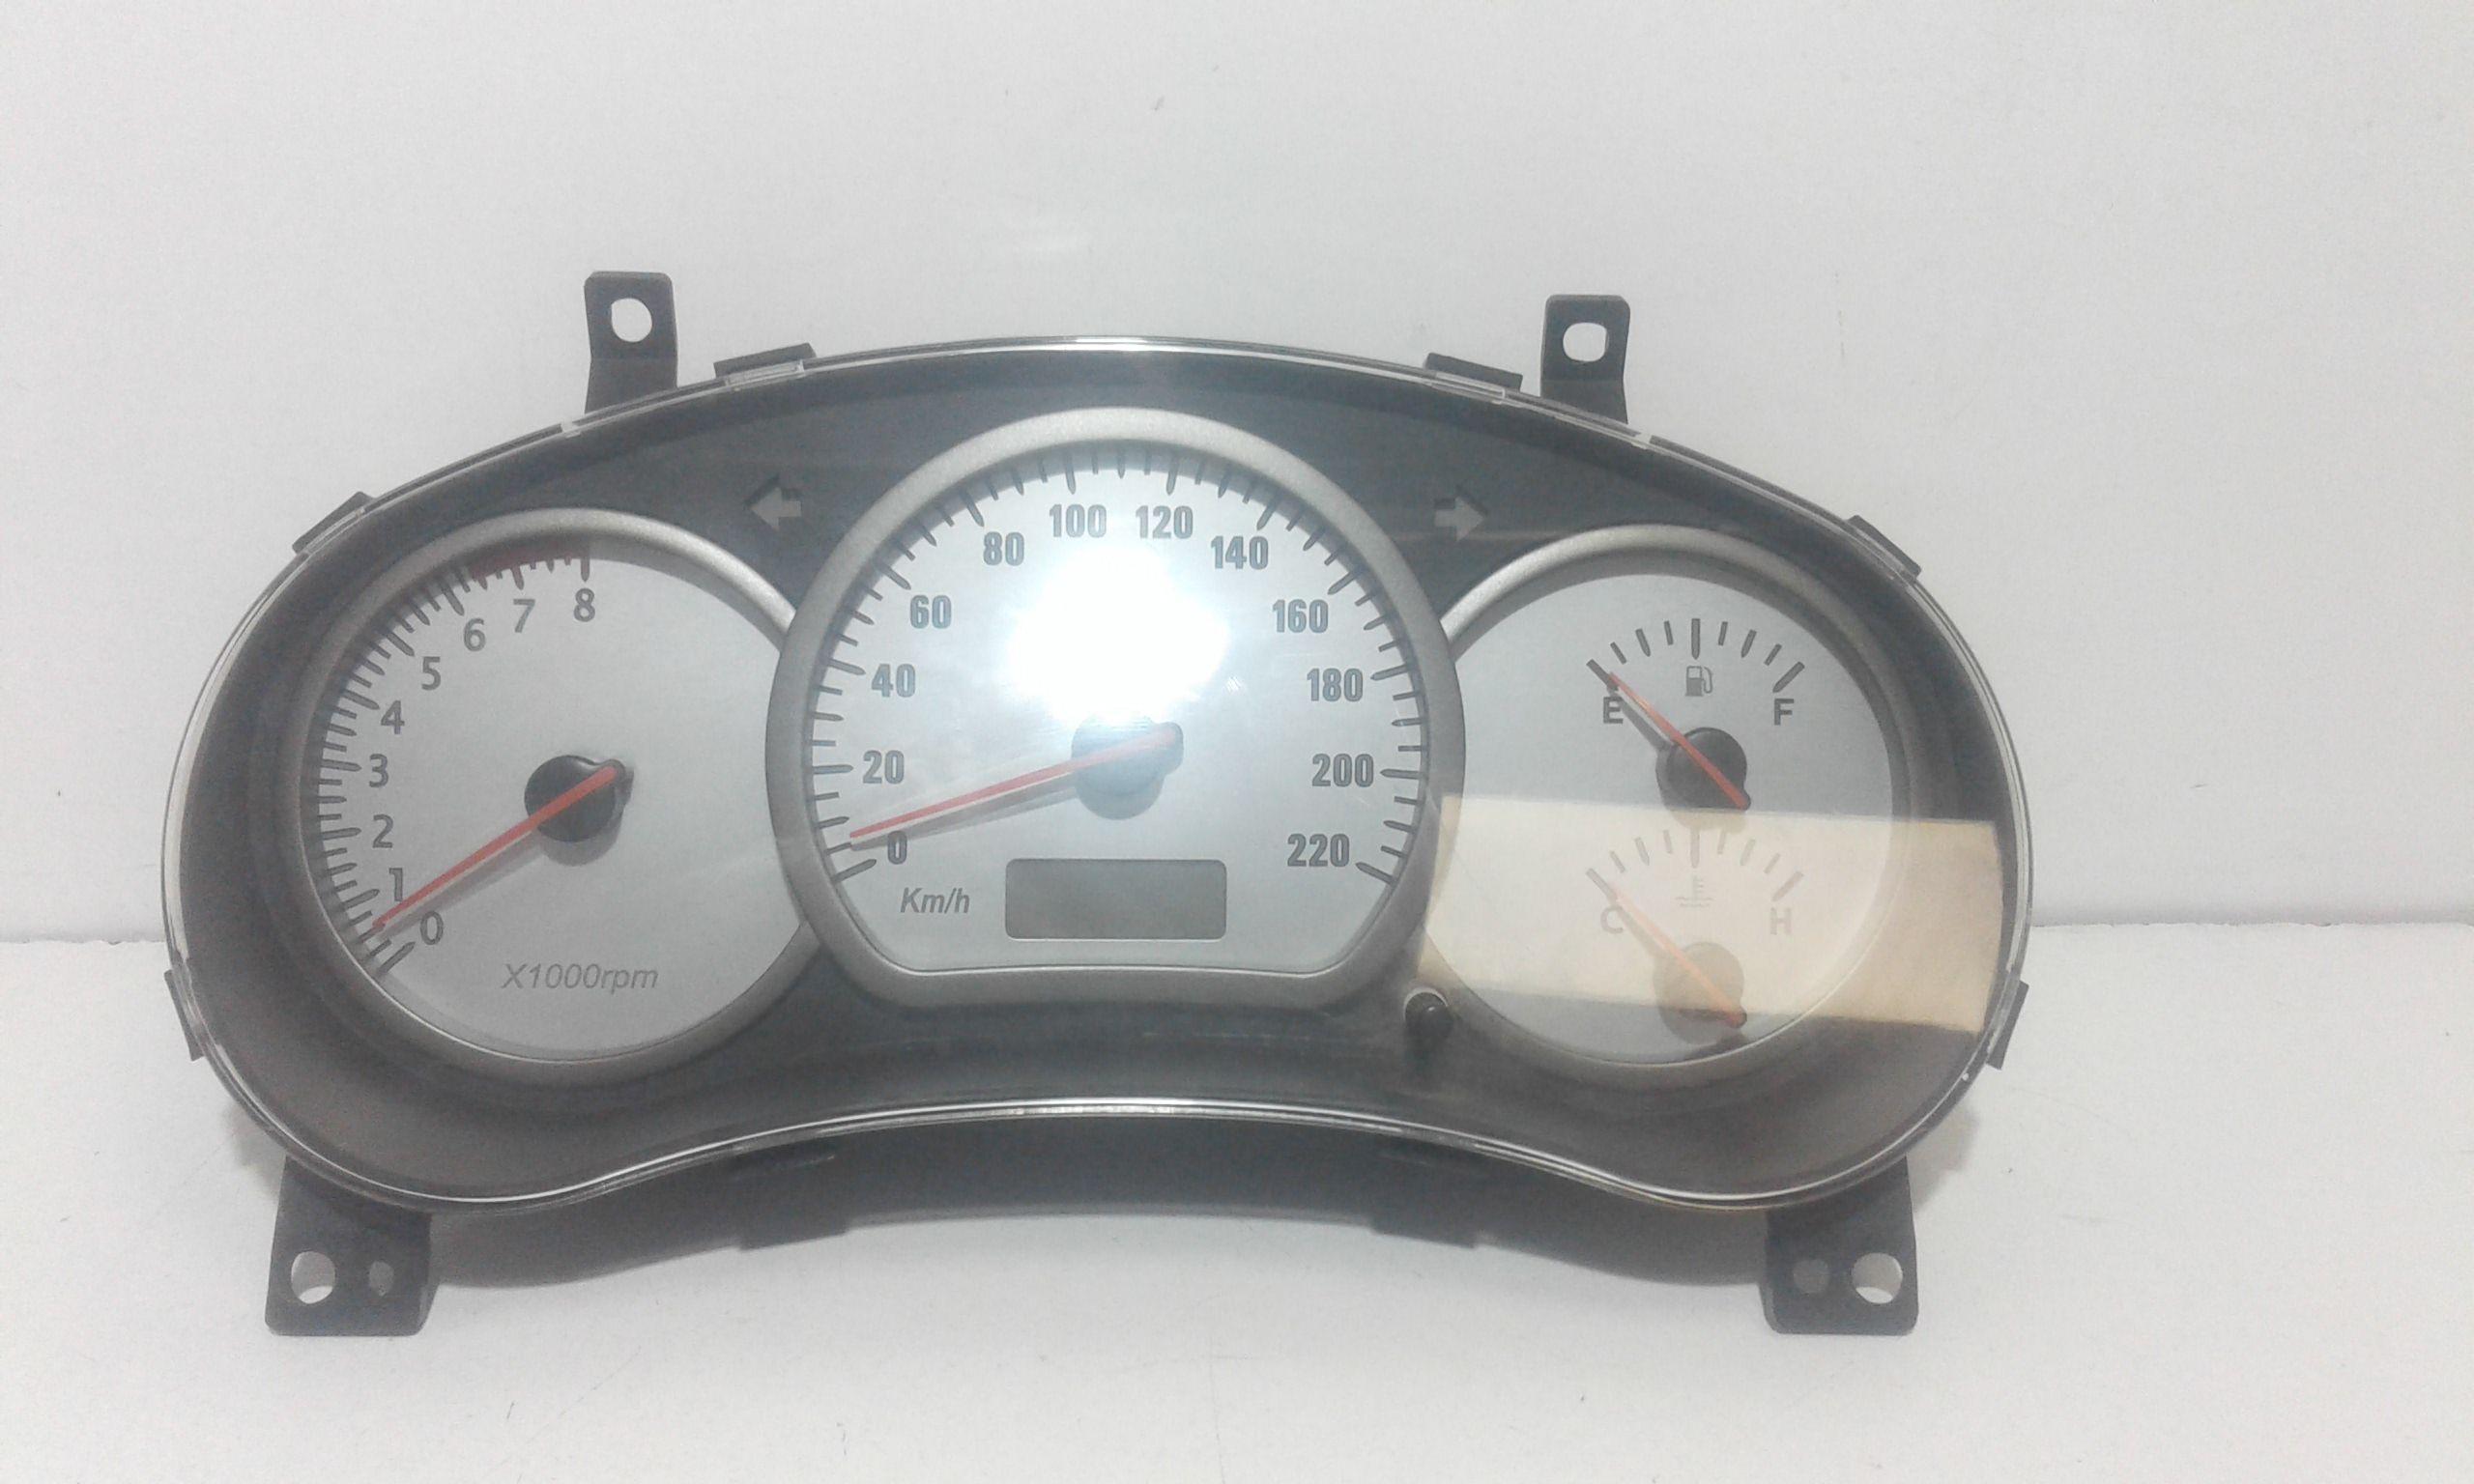 T11-3820010 CONTACHILOMETRI DR 5 1° Serie 1600 Benzina  (2008) RICAMBI USATI